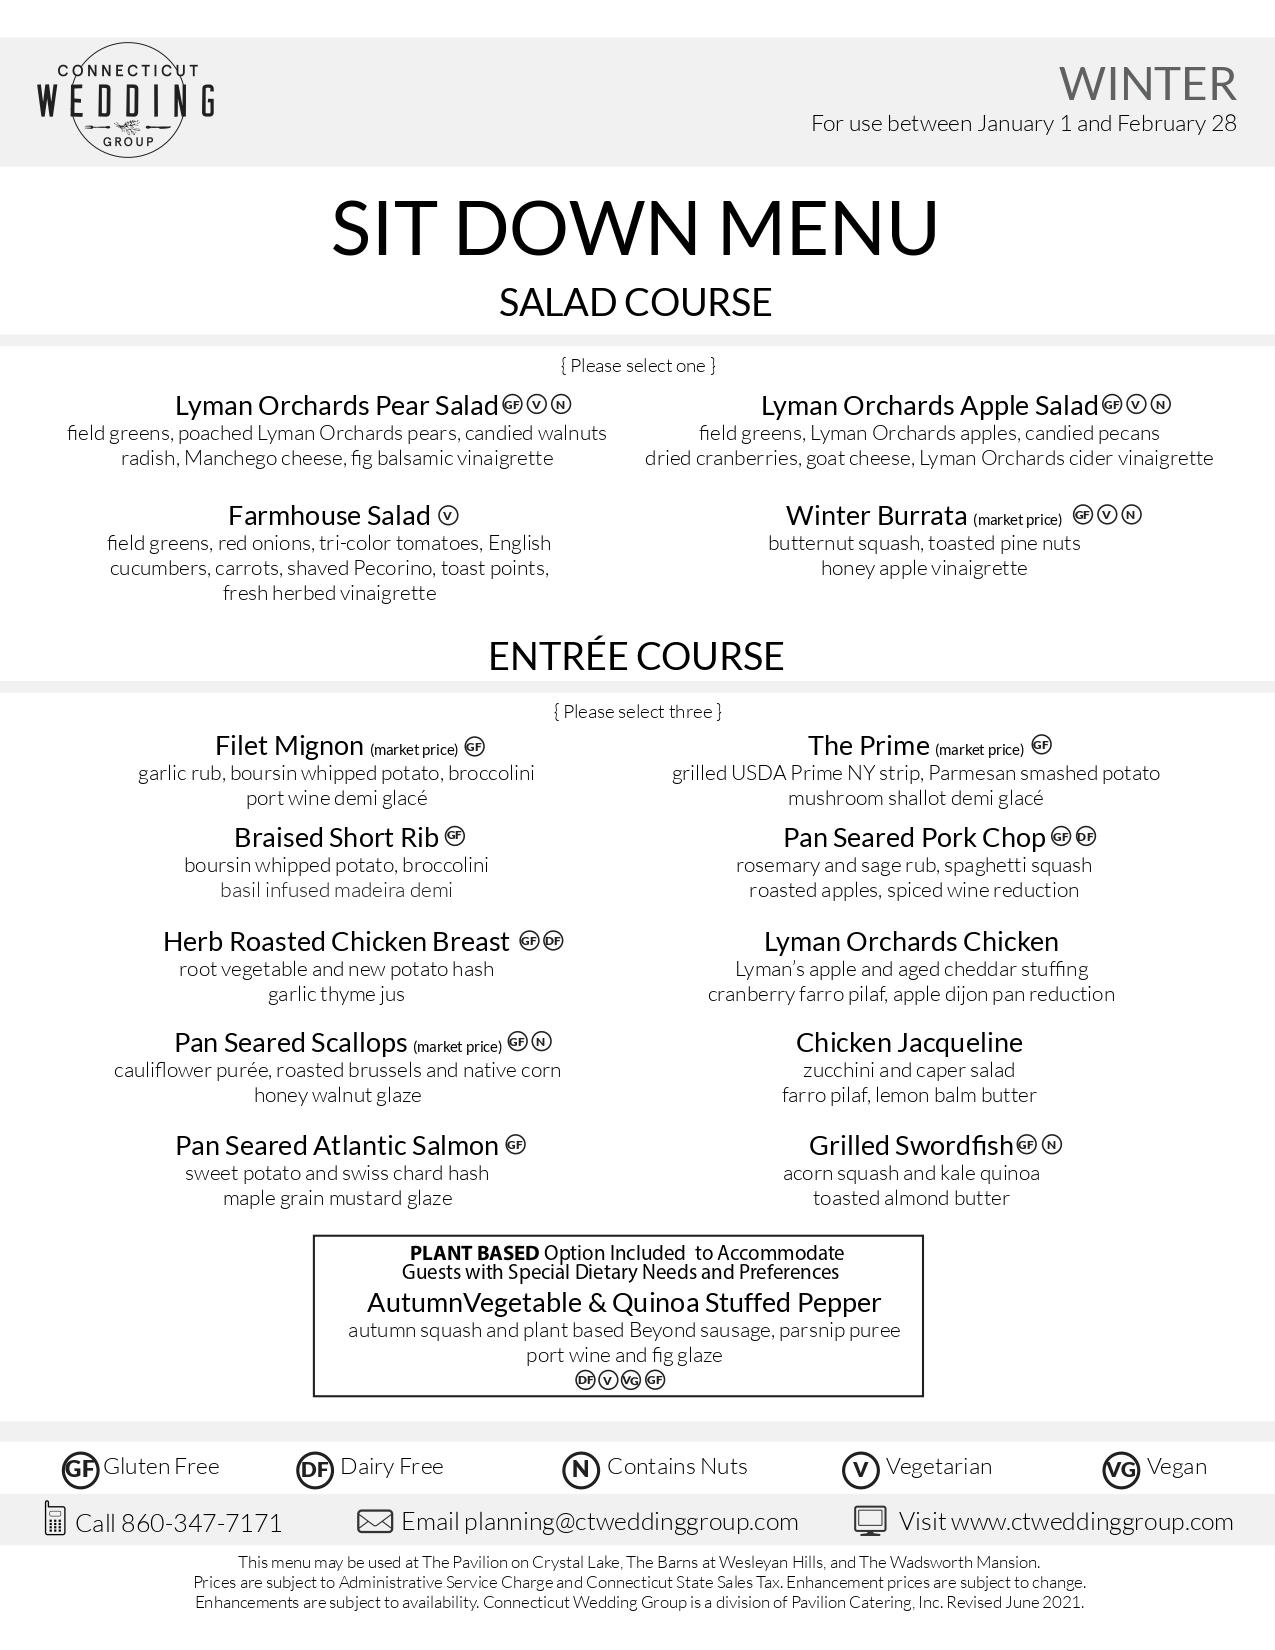 Winter-Sit-Down-Buffet-Menu-2022_page-0001